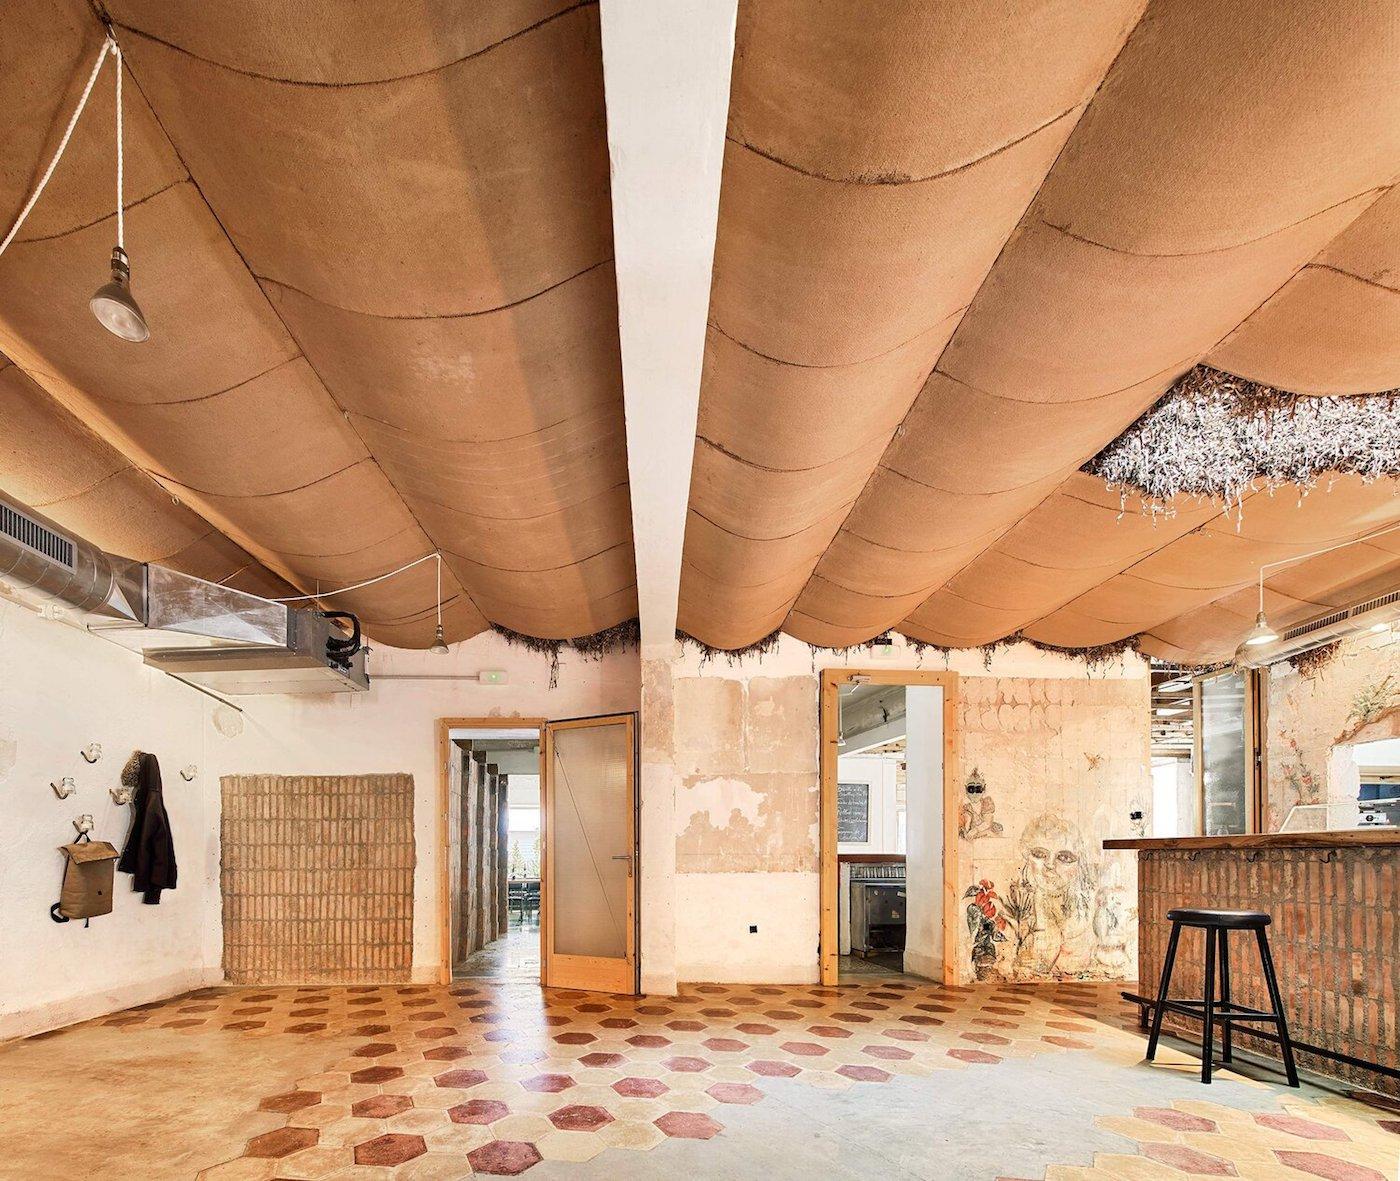 Vaulted ceiling looking towards bathrooms